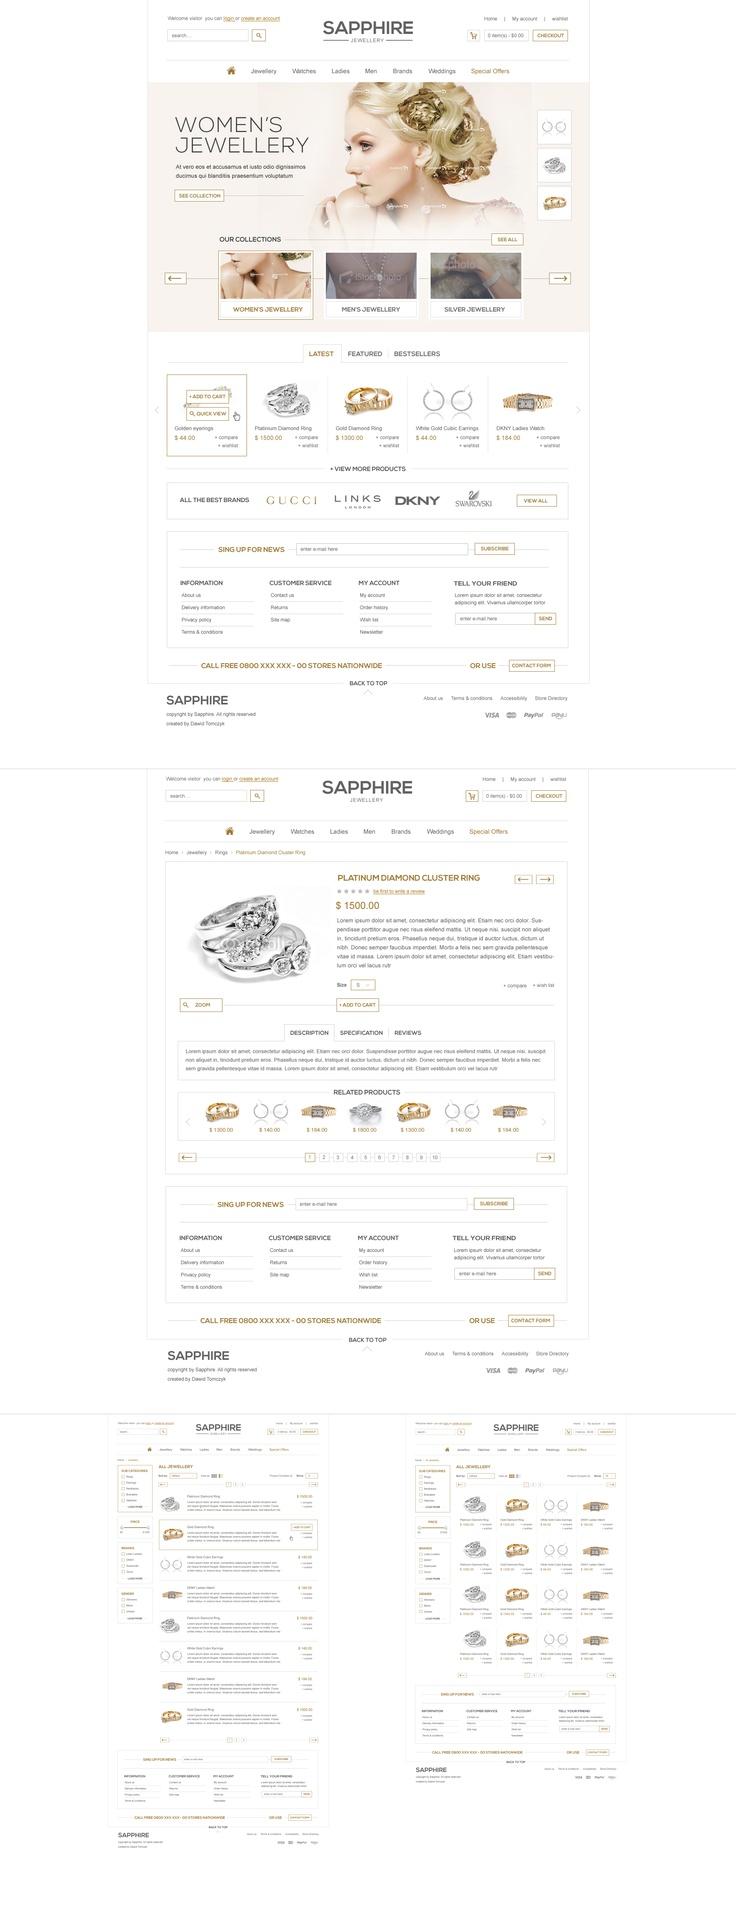 Sapphire jewellery by ~davidpstone on deviantART #design #web #webdesign #layout #site #website #www #ecommerce #e-commerce #commerce #online #shop #store #fashion #clothes #clothing #winter #wardrobe